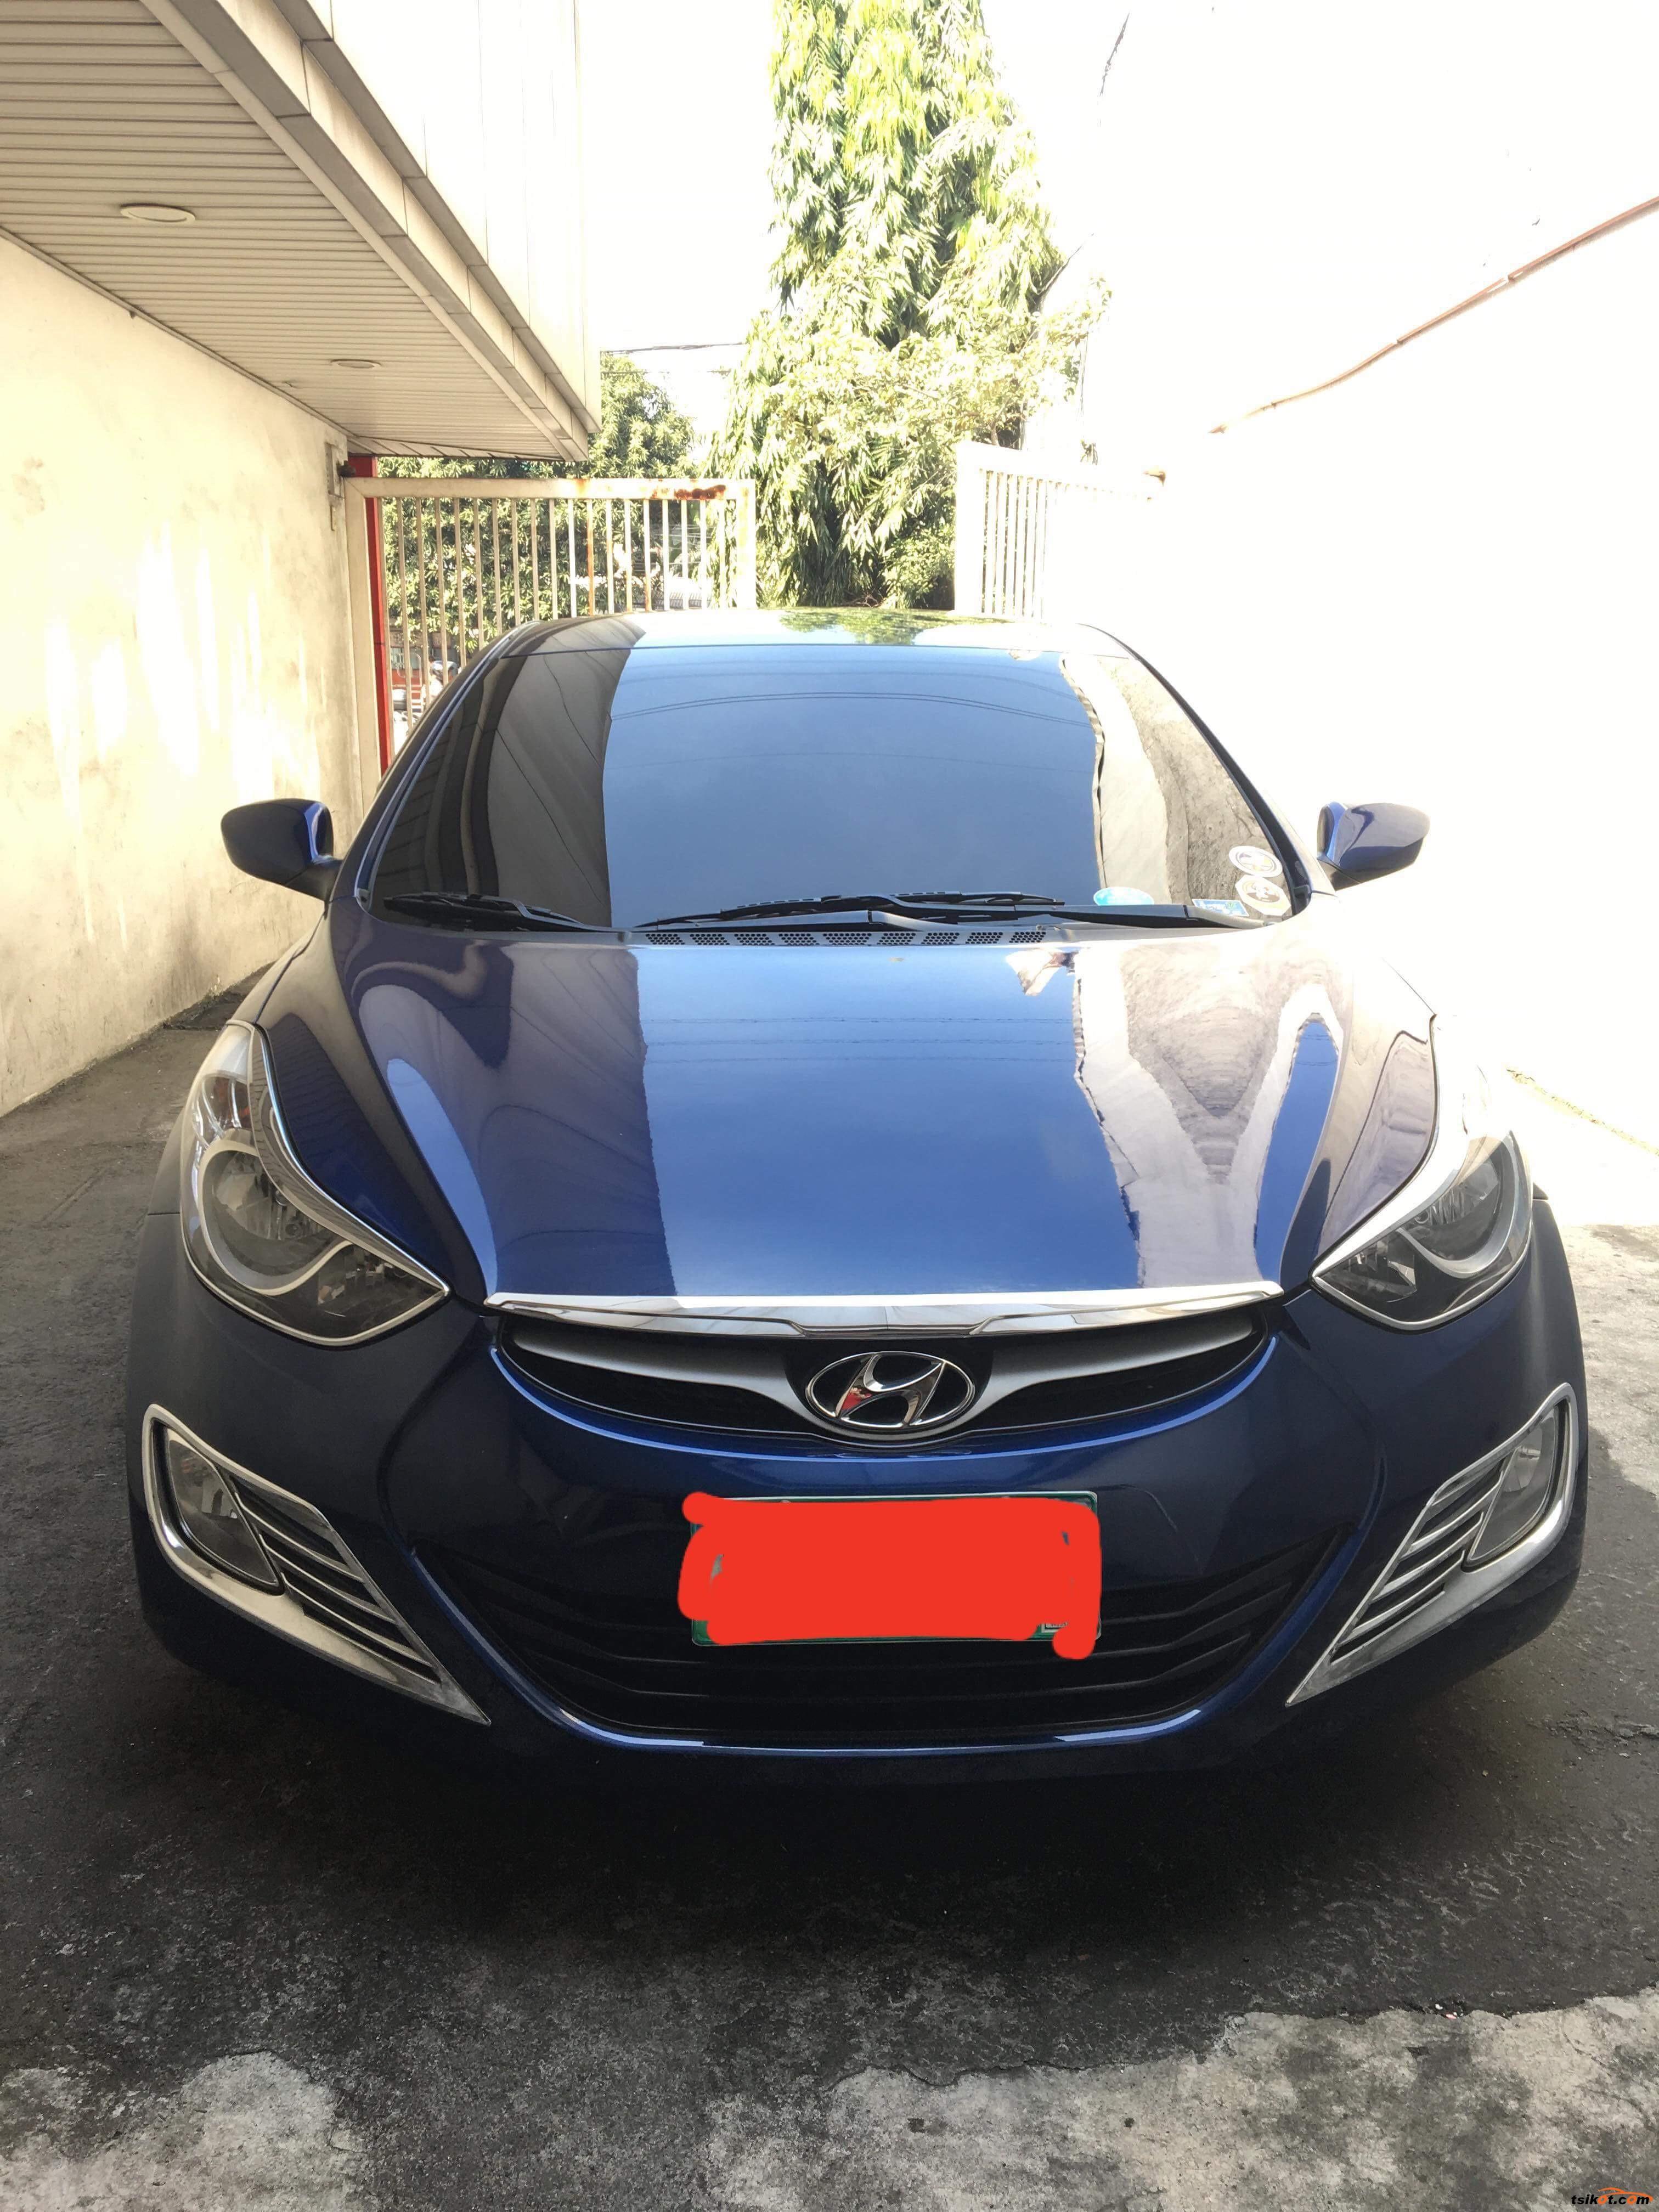 Hyundai Elantra 2013 - 1